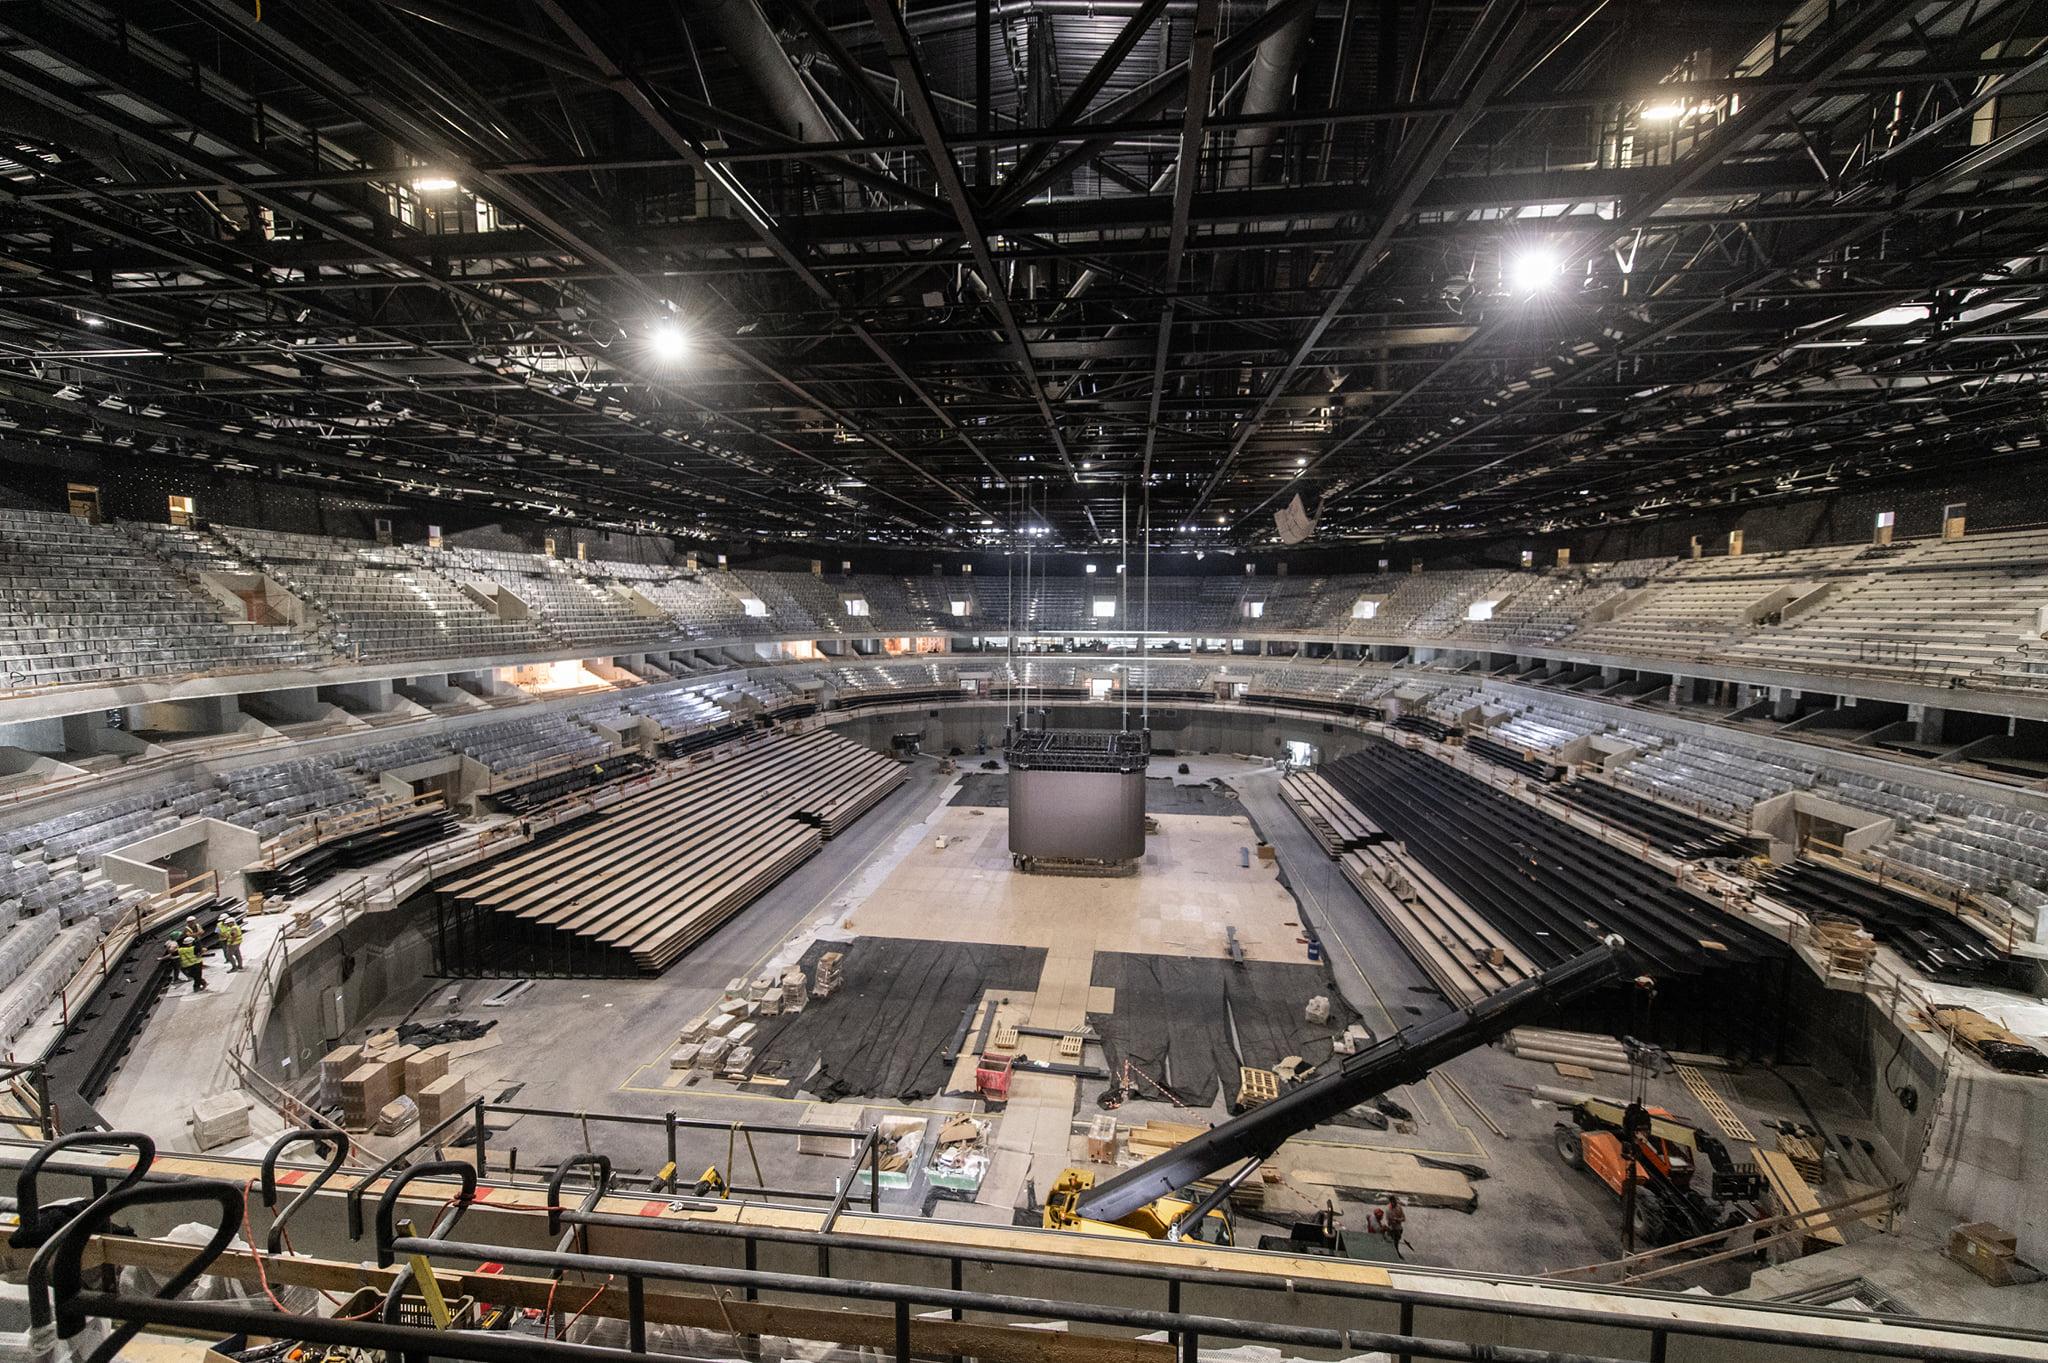 handball stadium budapest Interior building 2